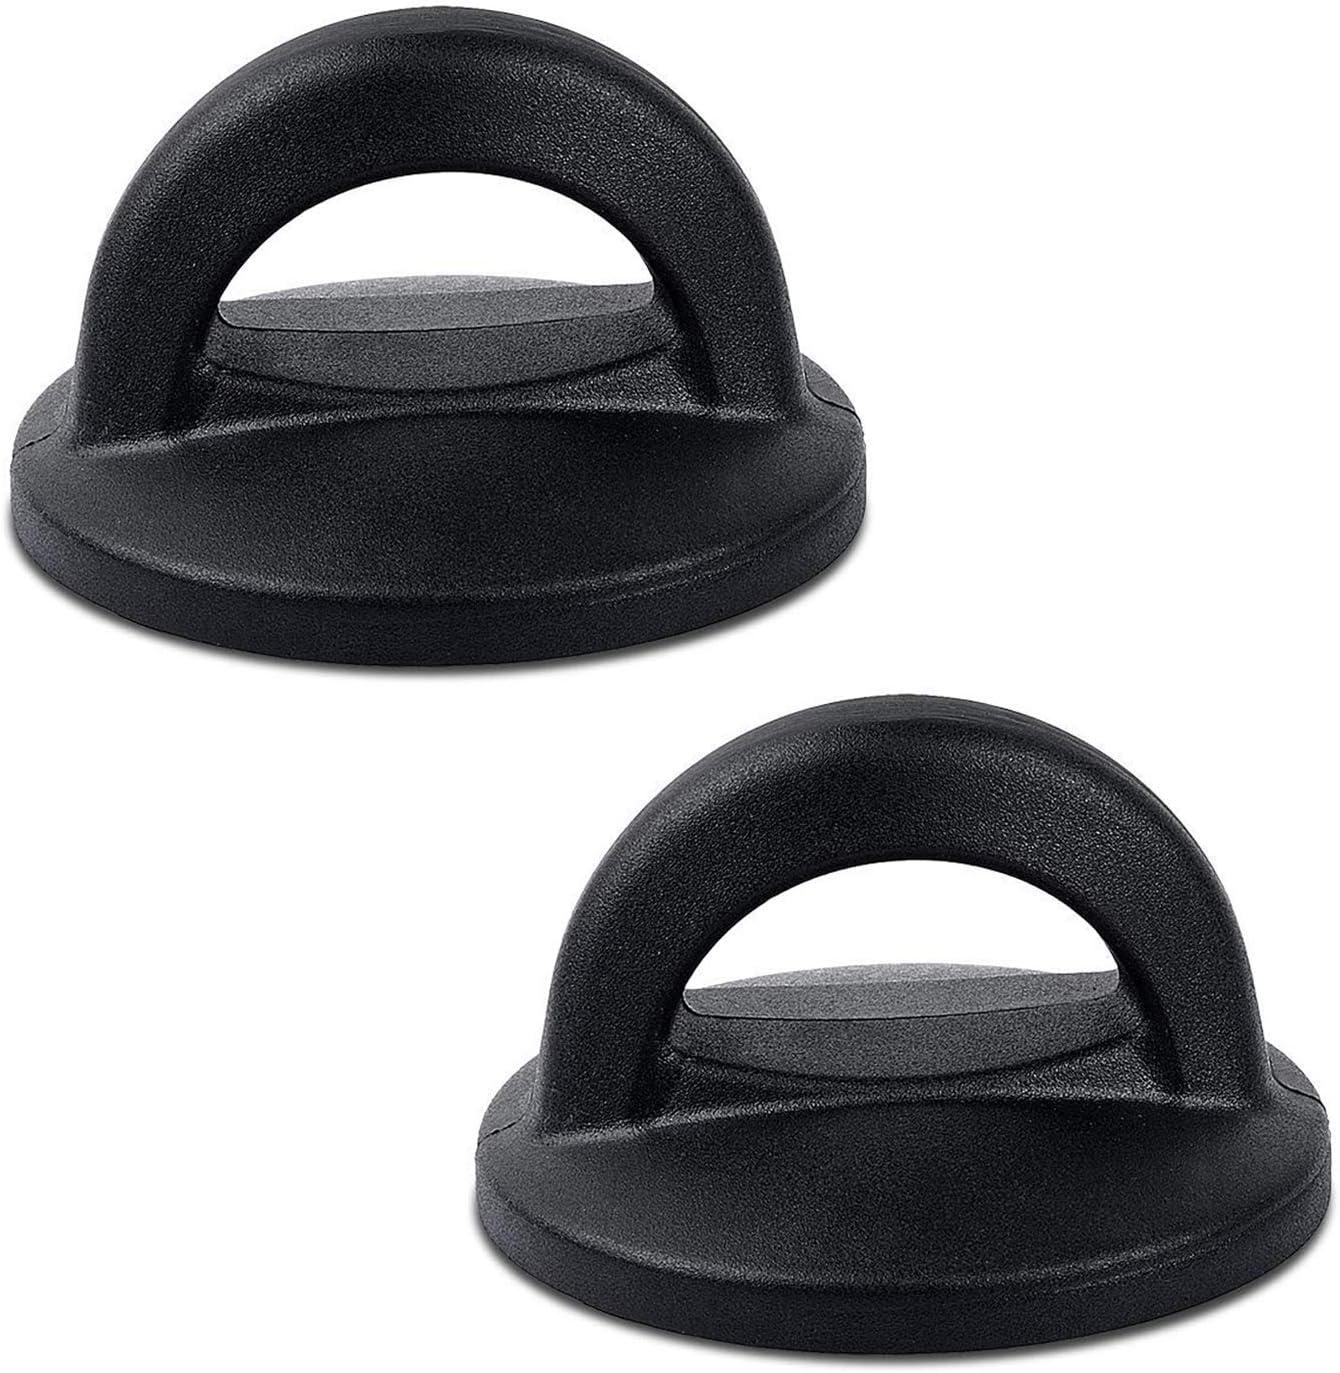 Universal Pot Lid Replacement Knob Black - 1 Piece